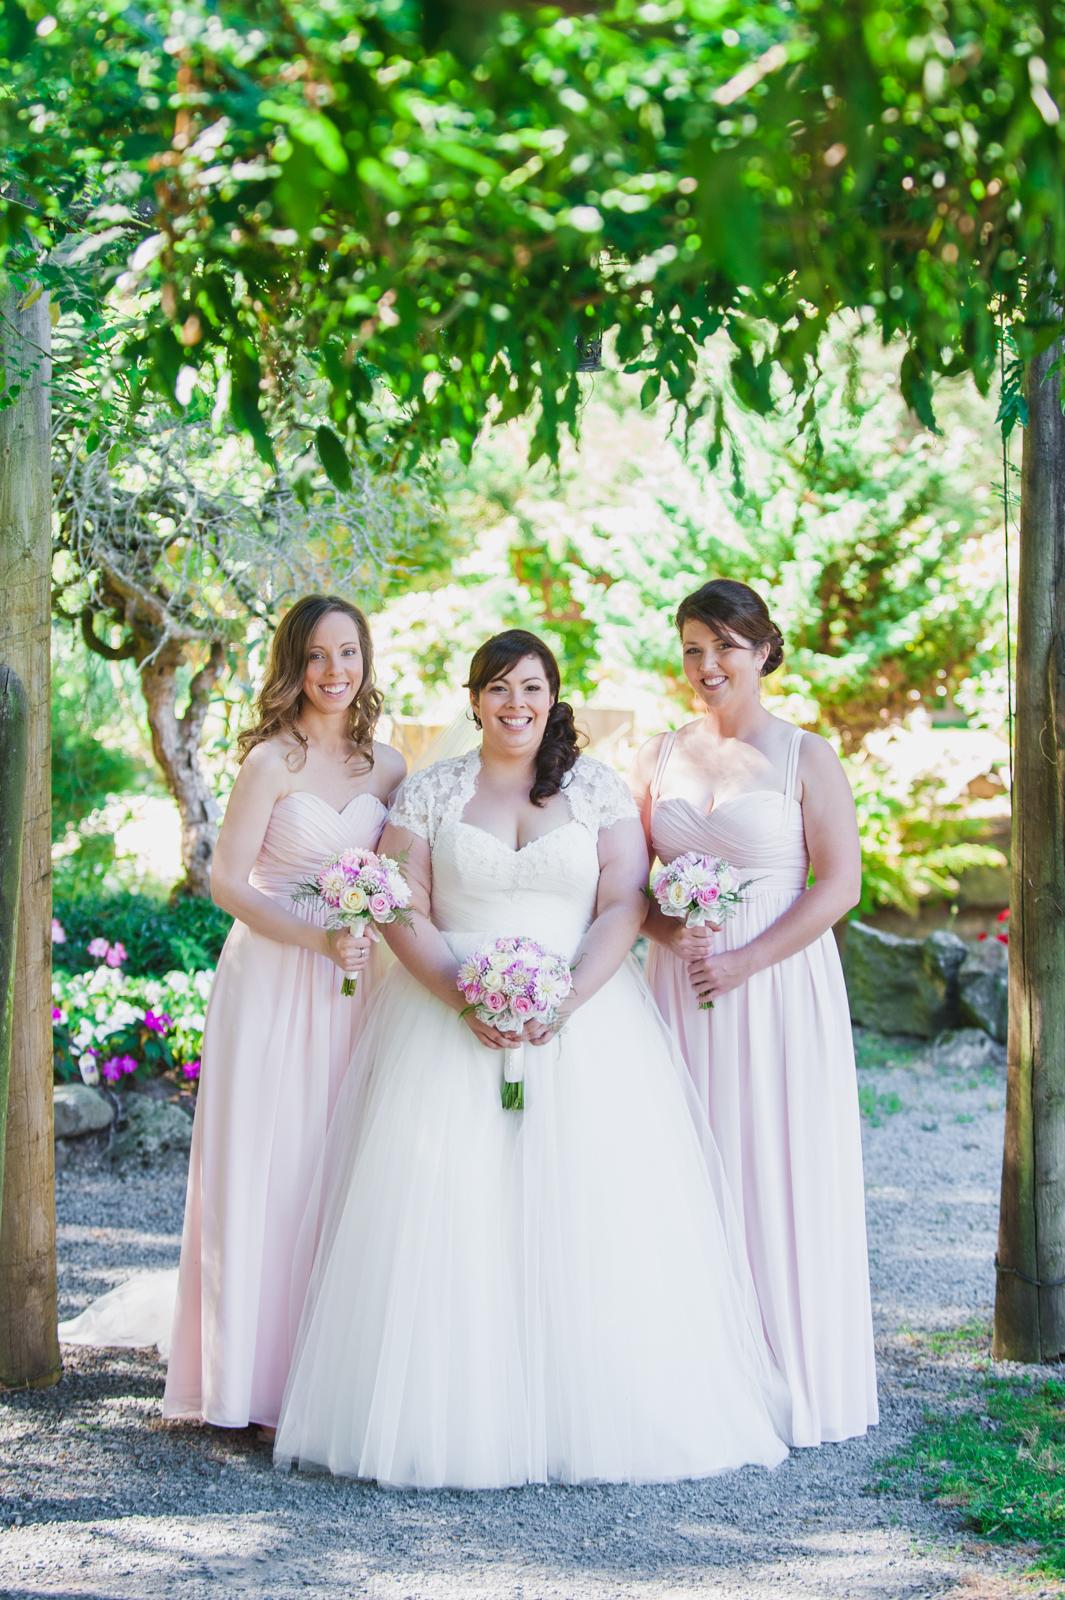 bc-wedding-photographers-harrison-lake-wedding-32.jpg